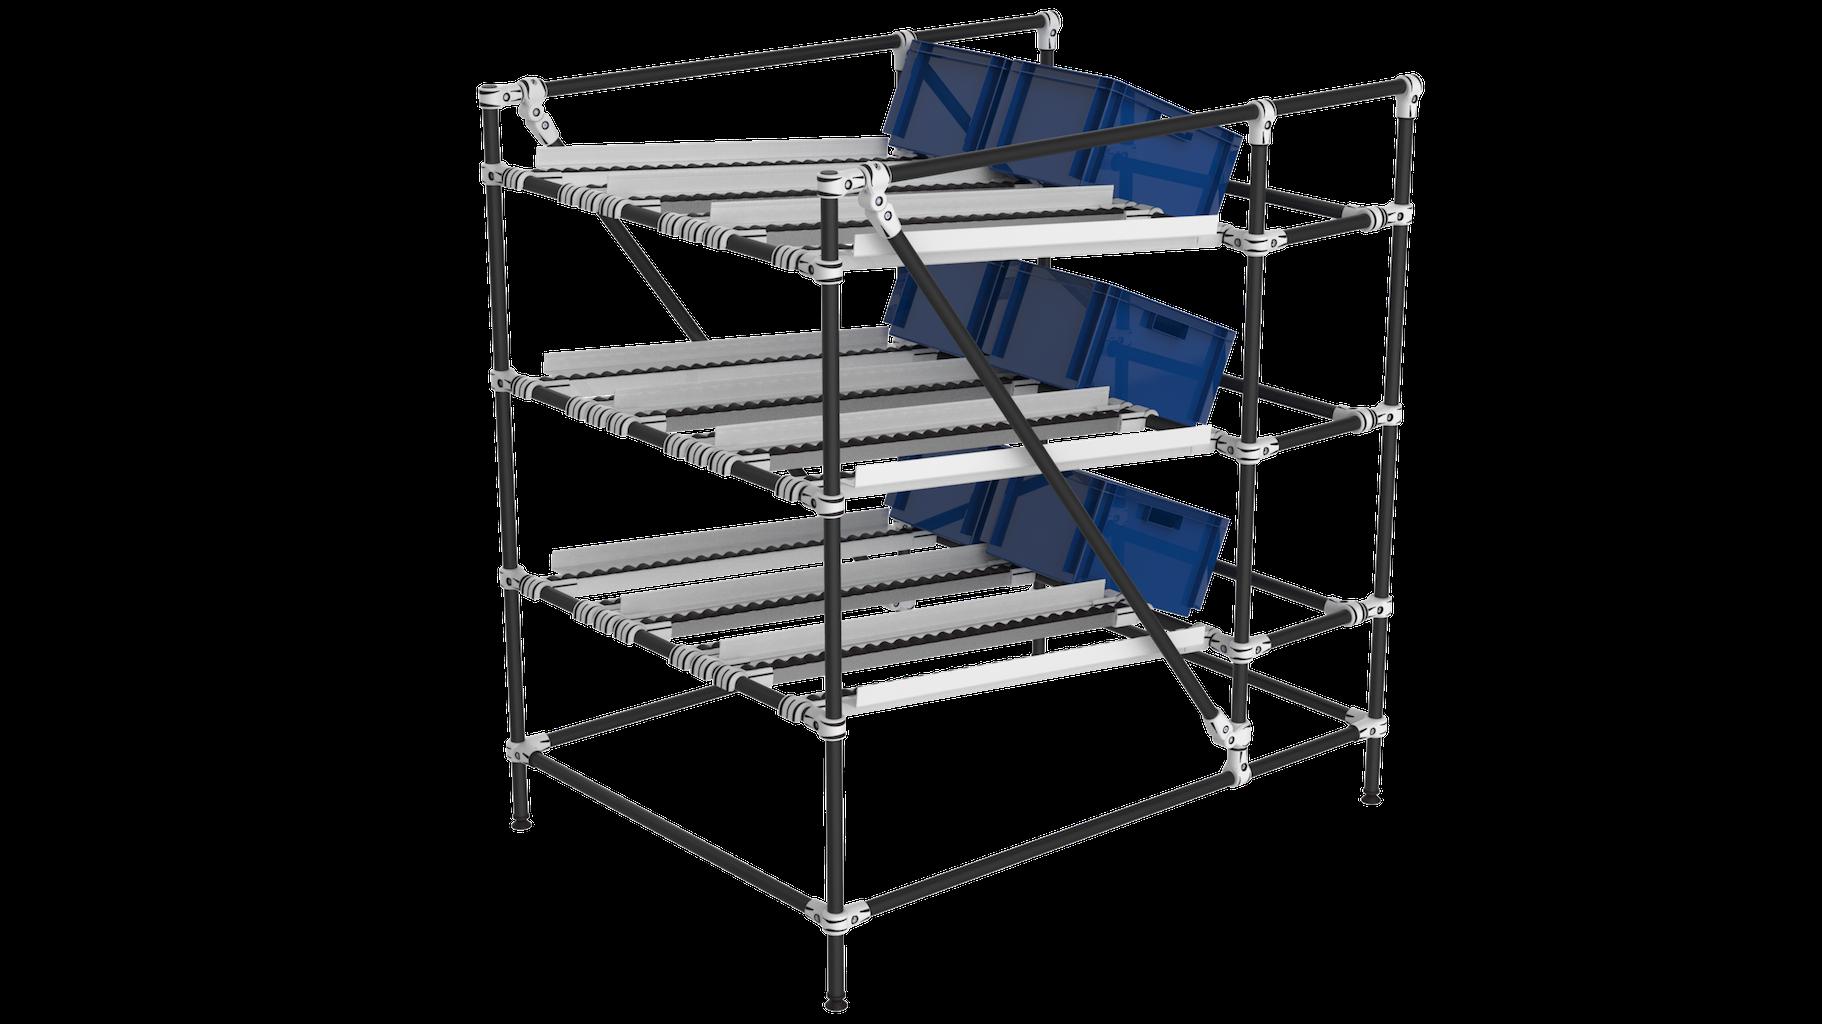 Gravity flow rack